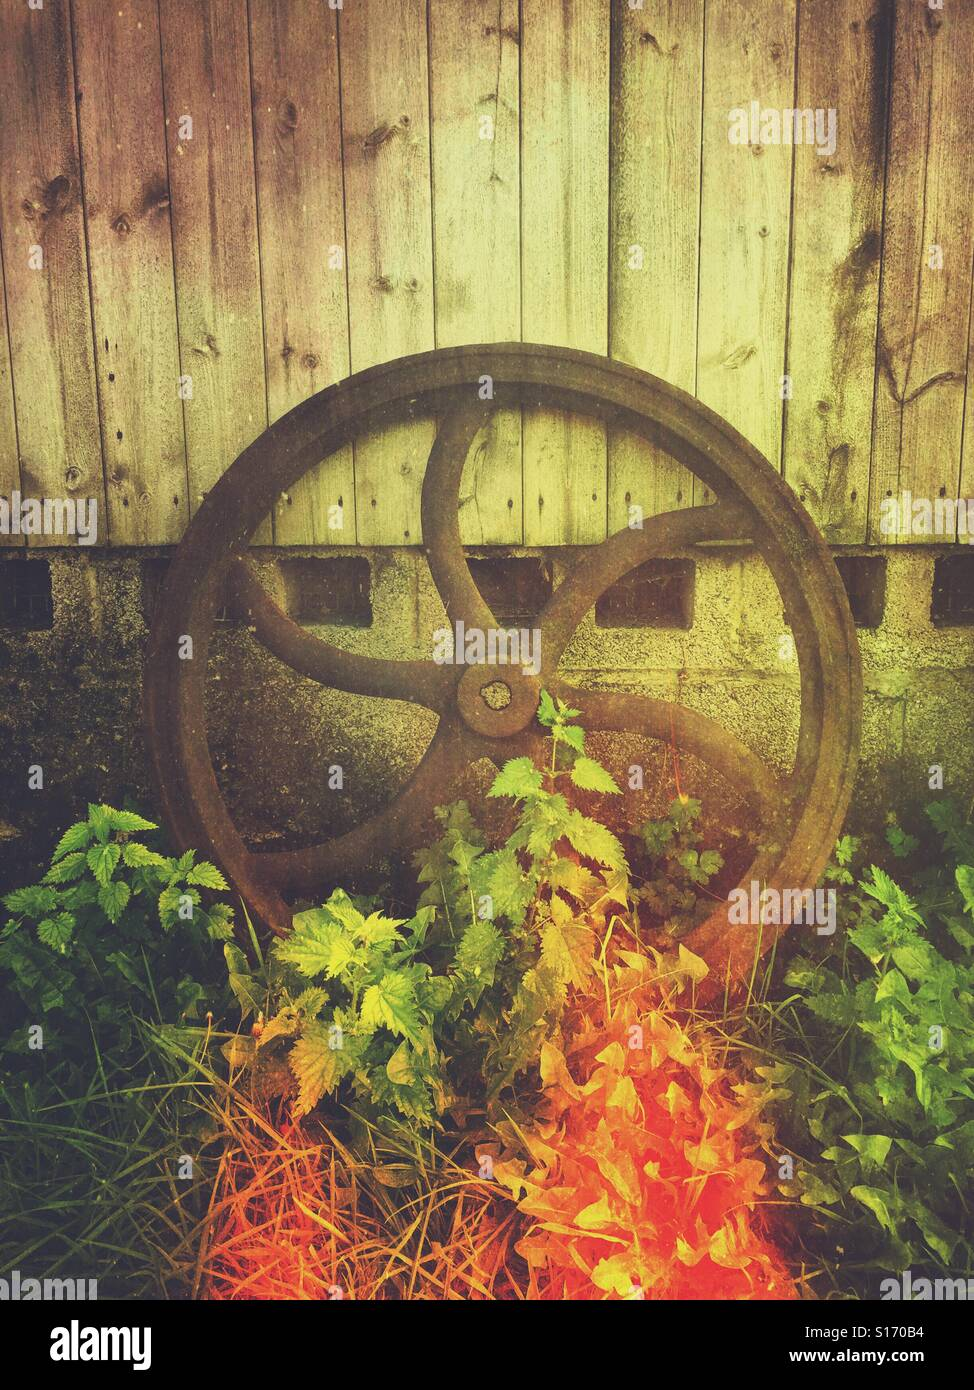 Old rusty machine wheel - Stock Image